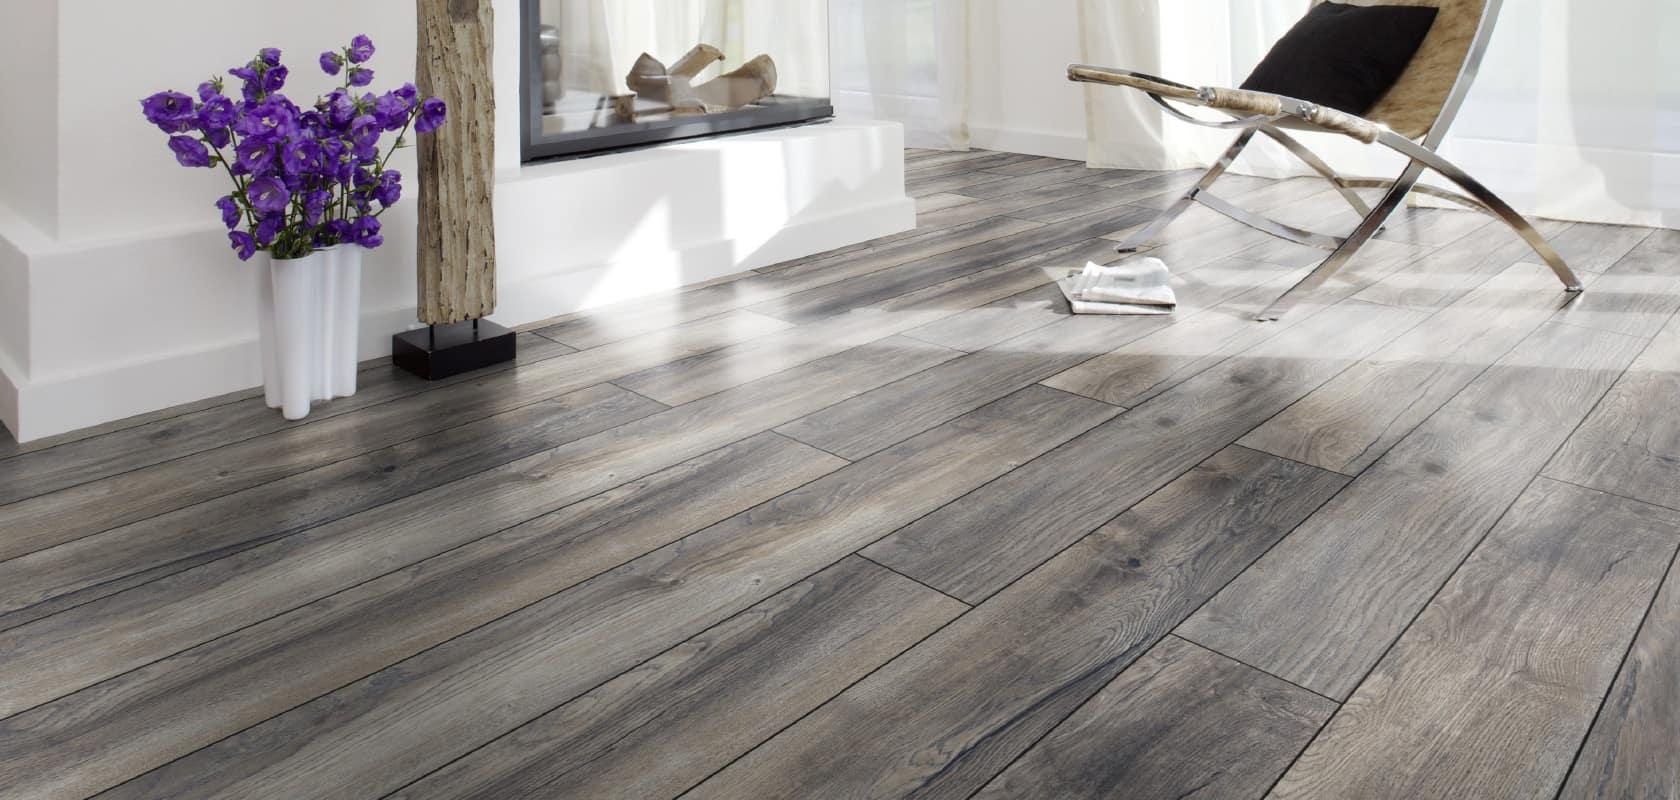 Tendencia 2021 en pisos de madera